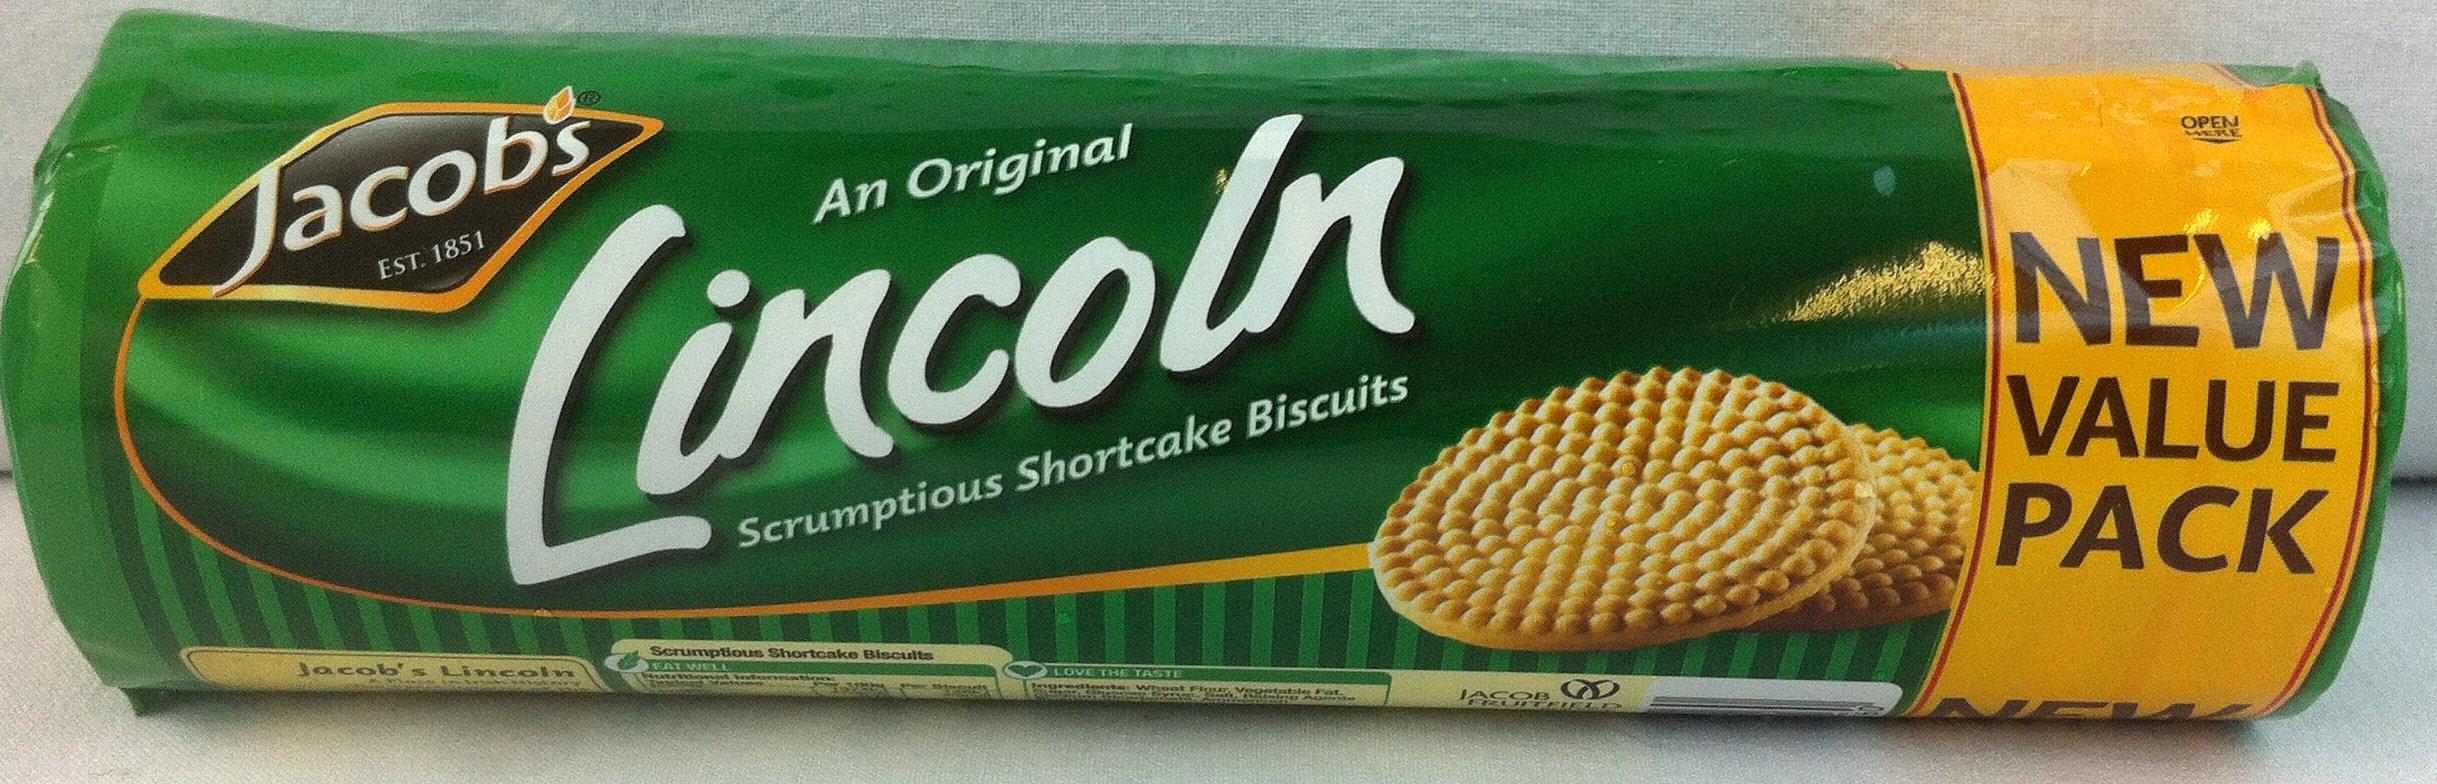 Avon Vale Uk Ltd Jacob S Lincoln Biscuits X 24 Wwlinc Jpg